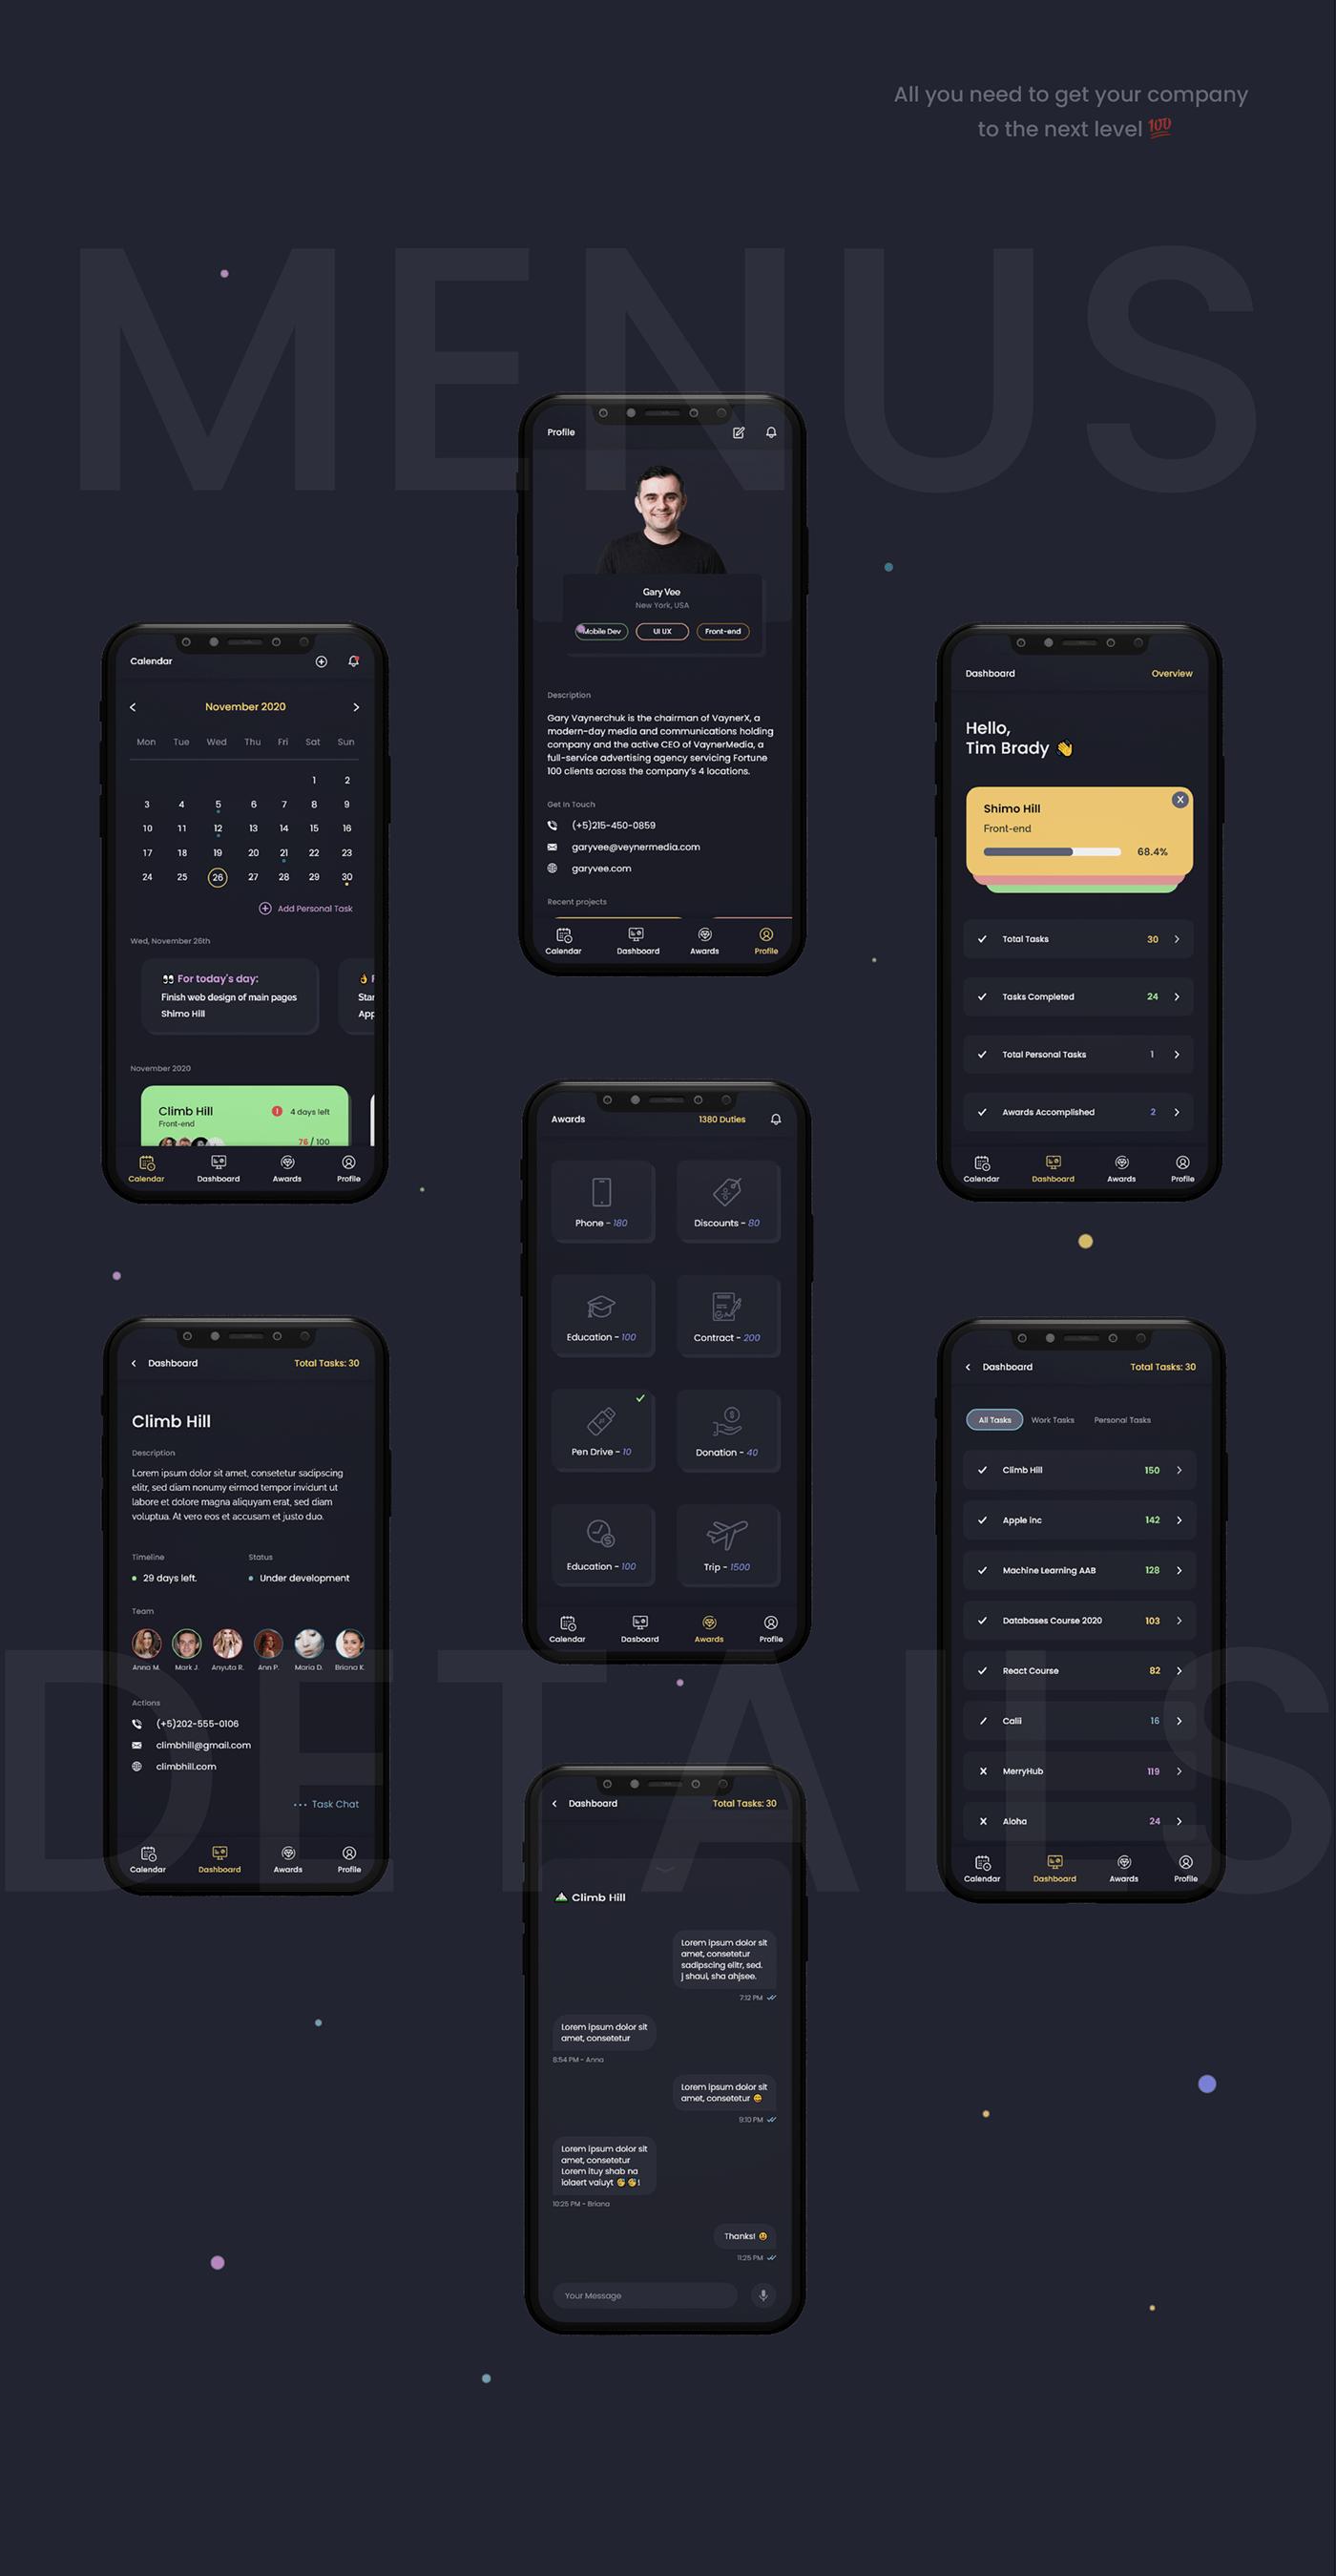 android app design app development Mobile app ui design UI/UX user experience user interface ux UX design